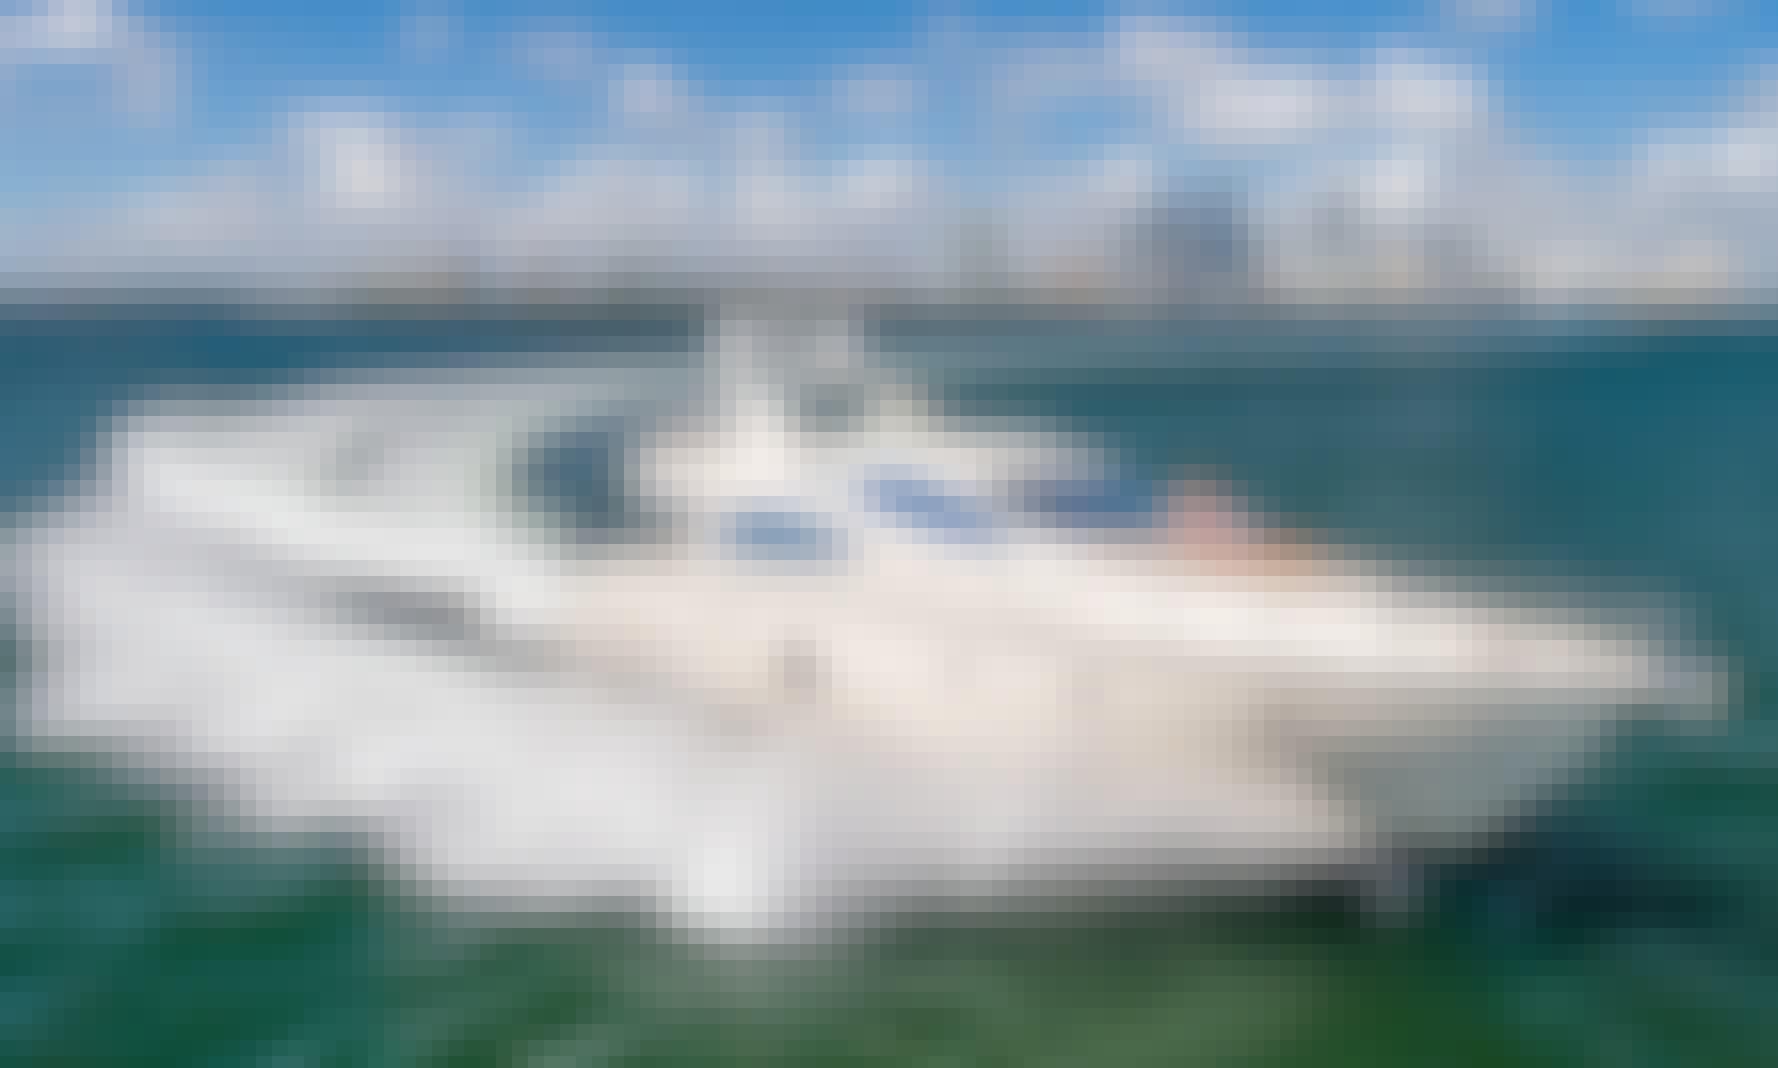 New 69' Aicon Luxury Italian Yacht with Toys in Miami, Florida